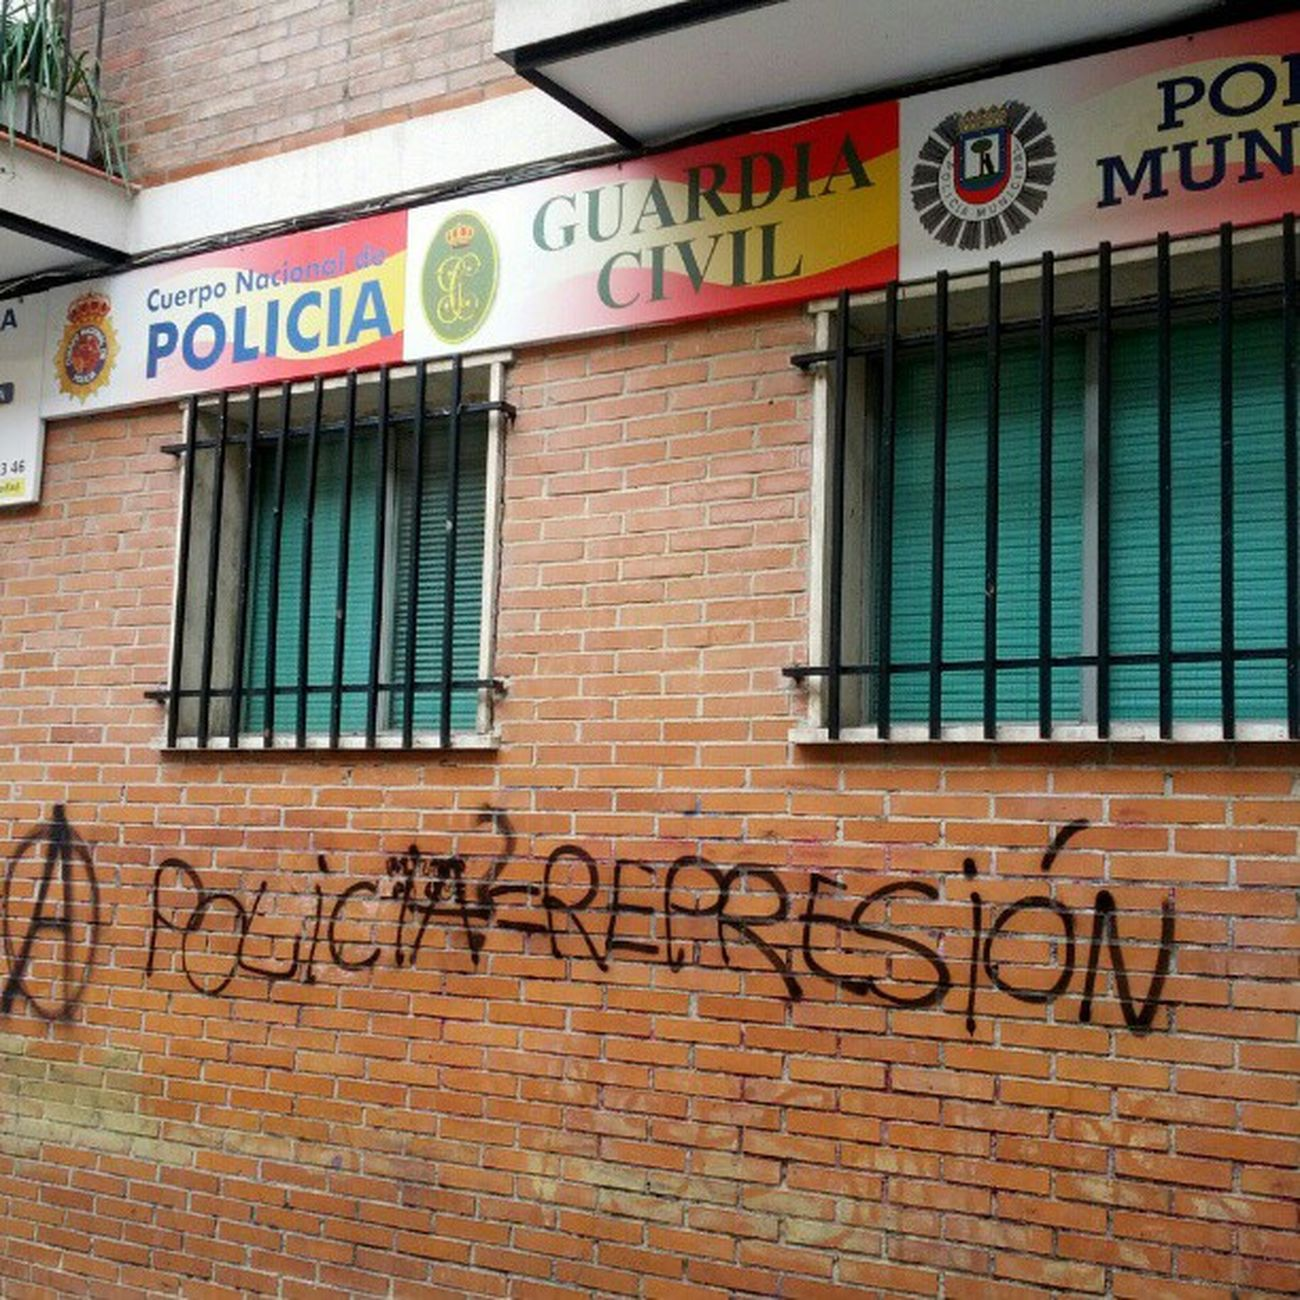 Lavapies  Policia Represion Police station acab (<) Madrid Spain graffiti